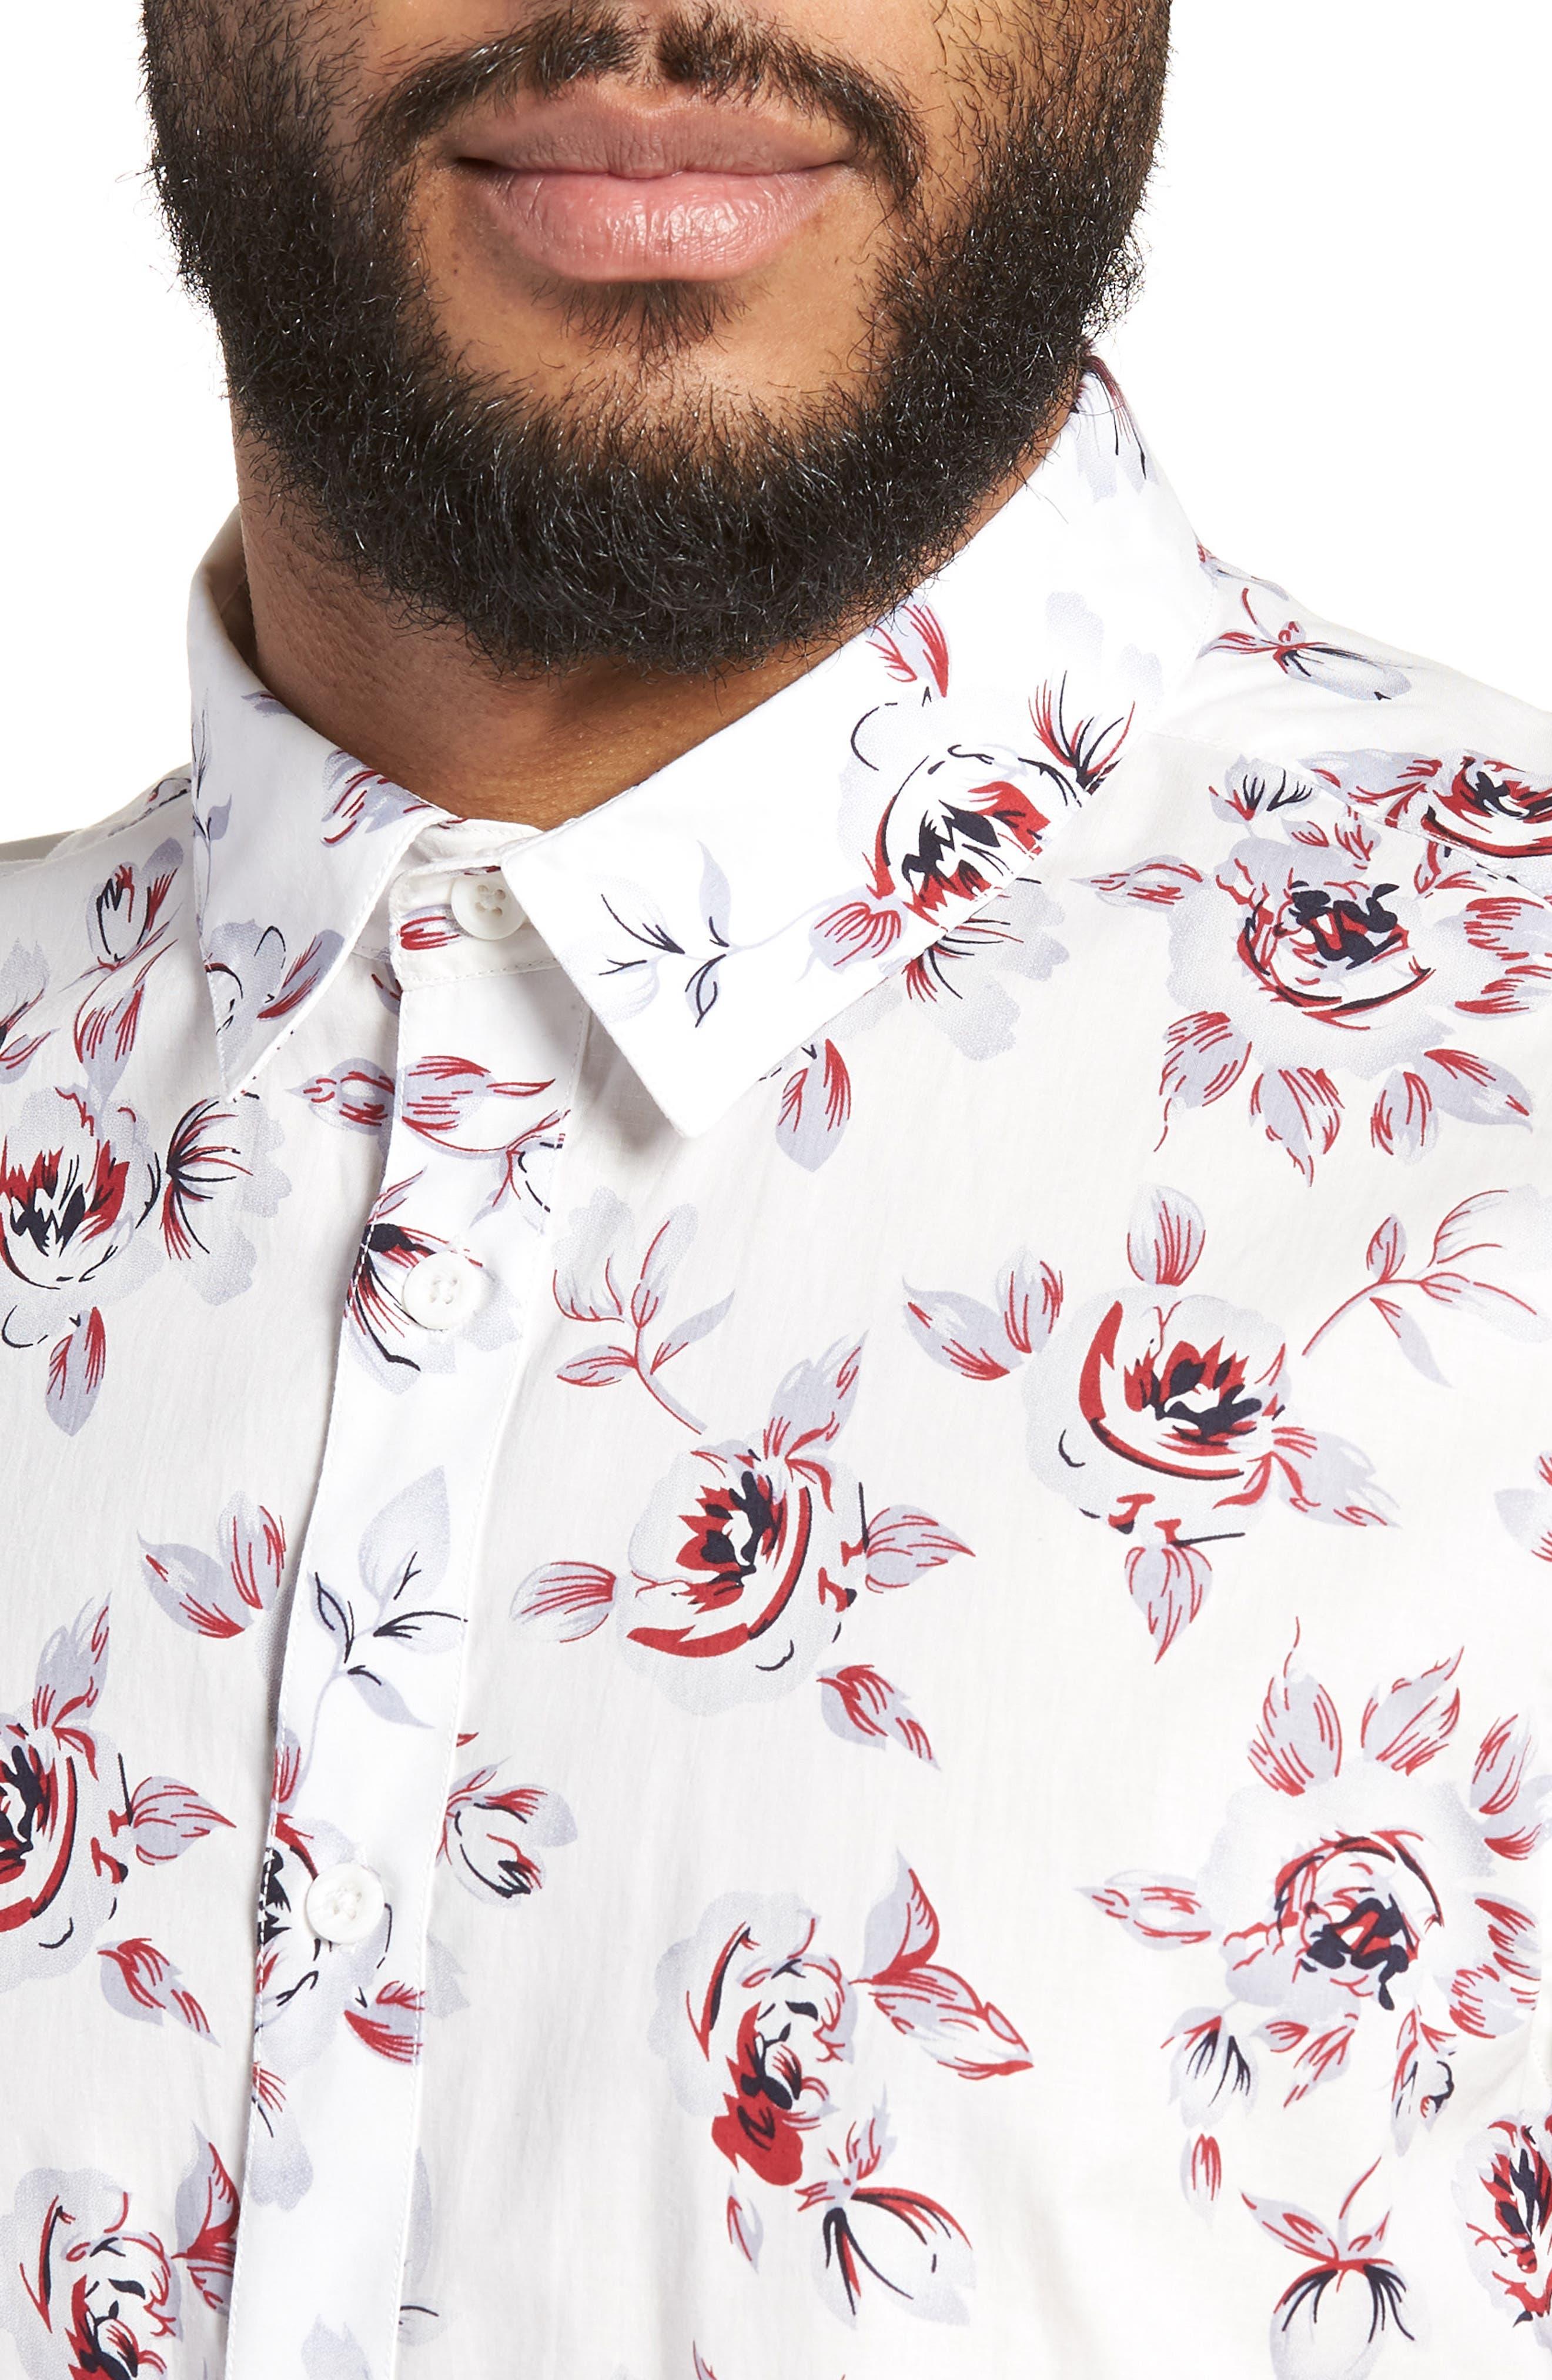 Trim Fit Print Woven Short Sleeve Shirt,                             Alternate thumbnail 4, color,                             White Red Rose